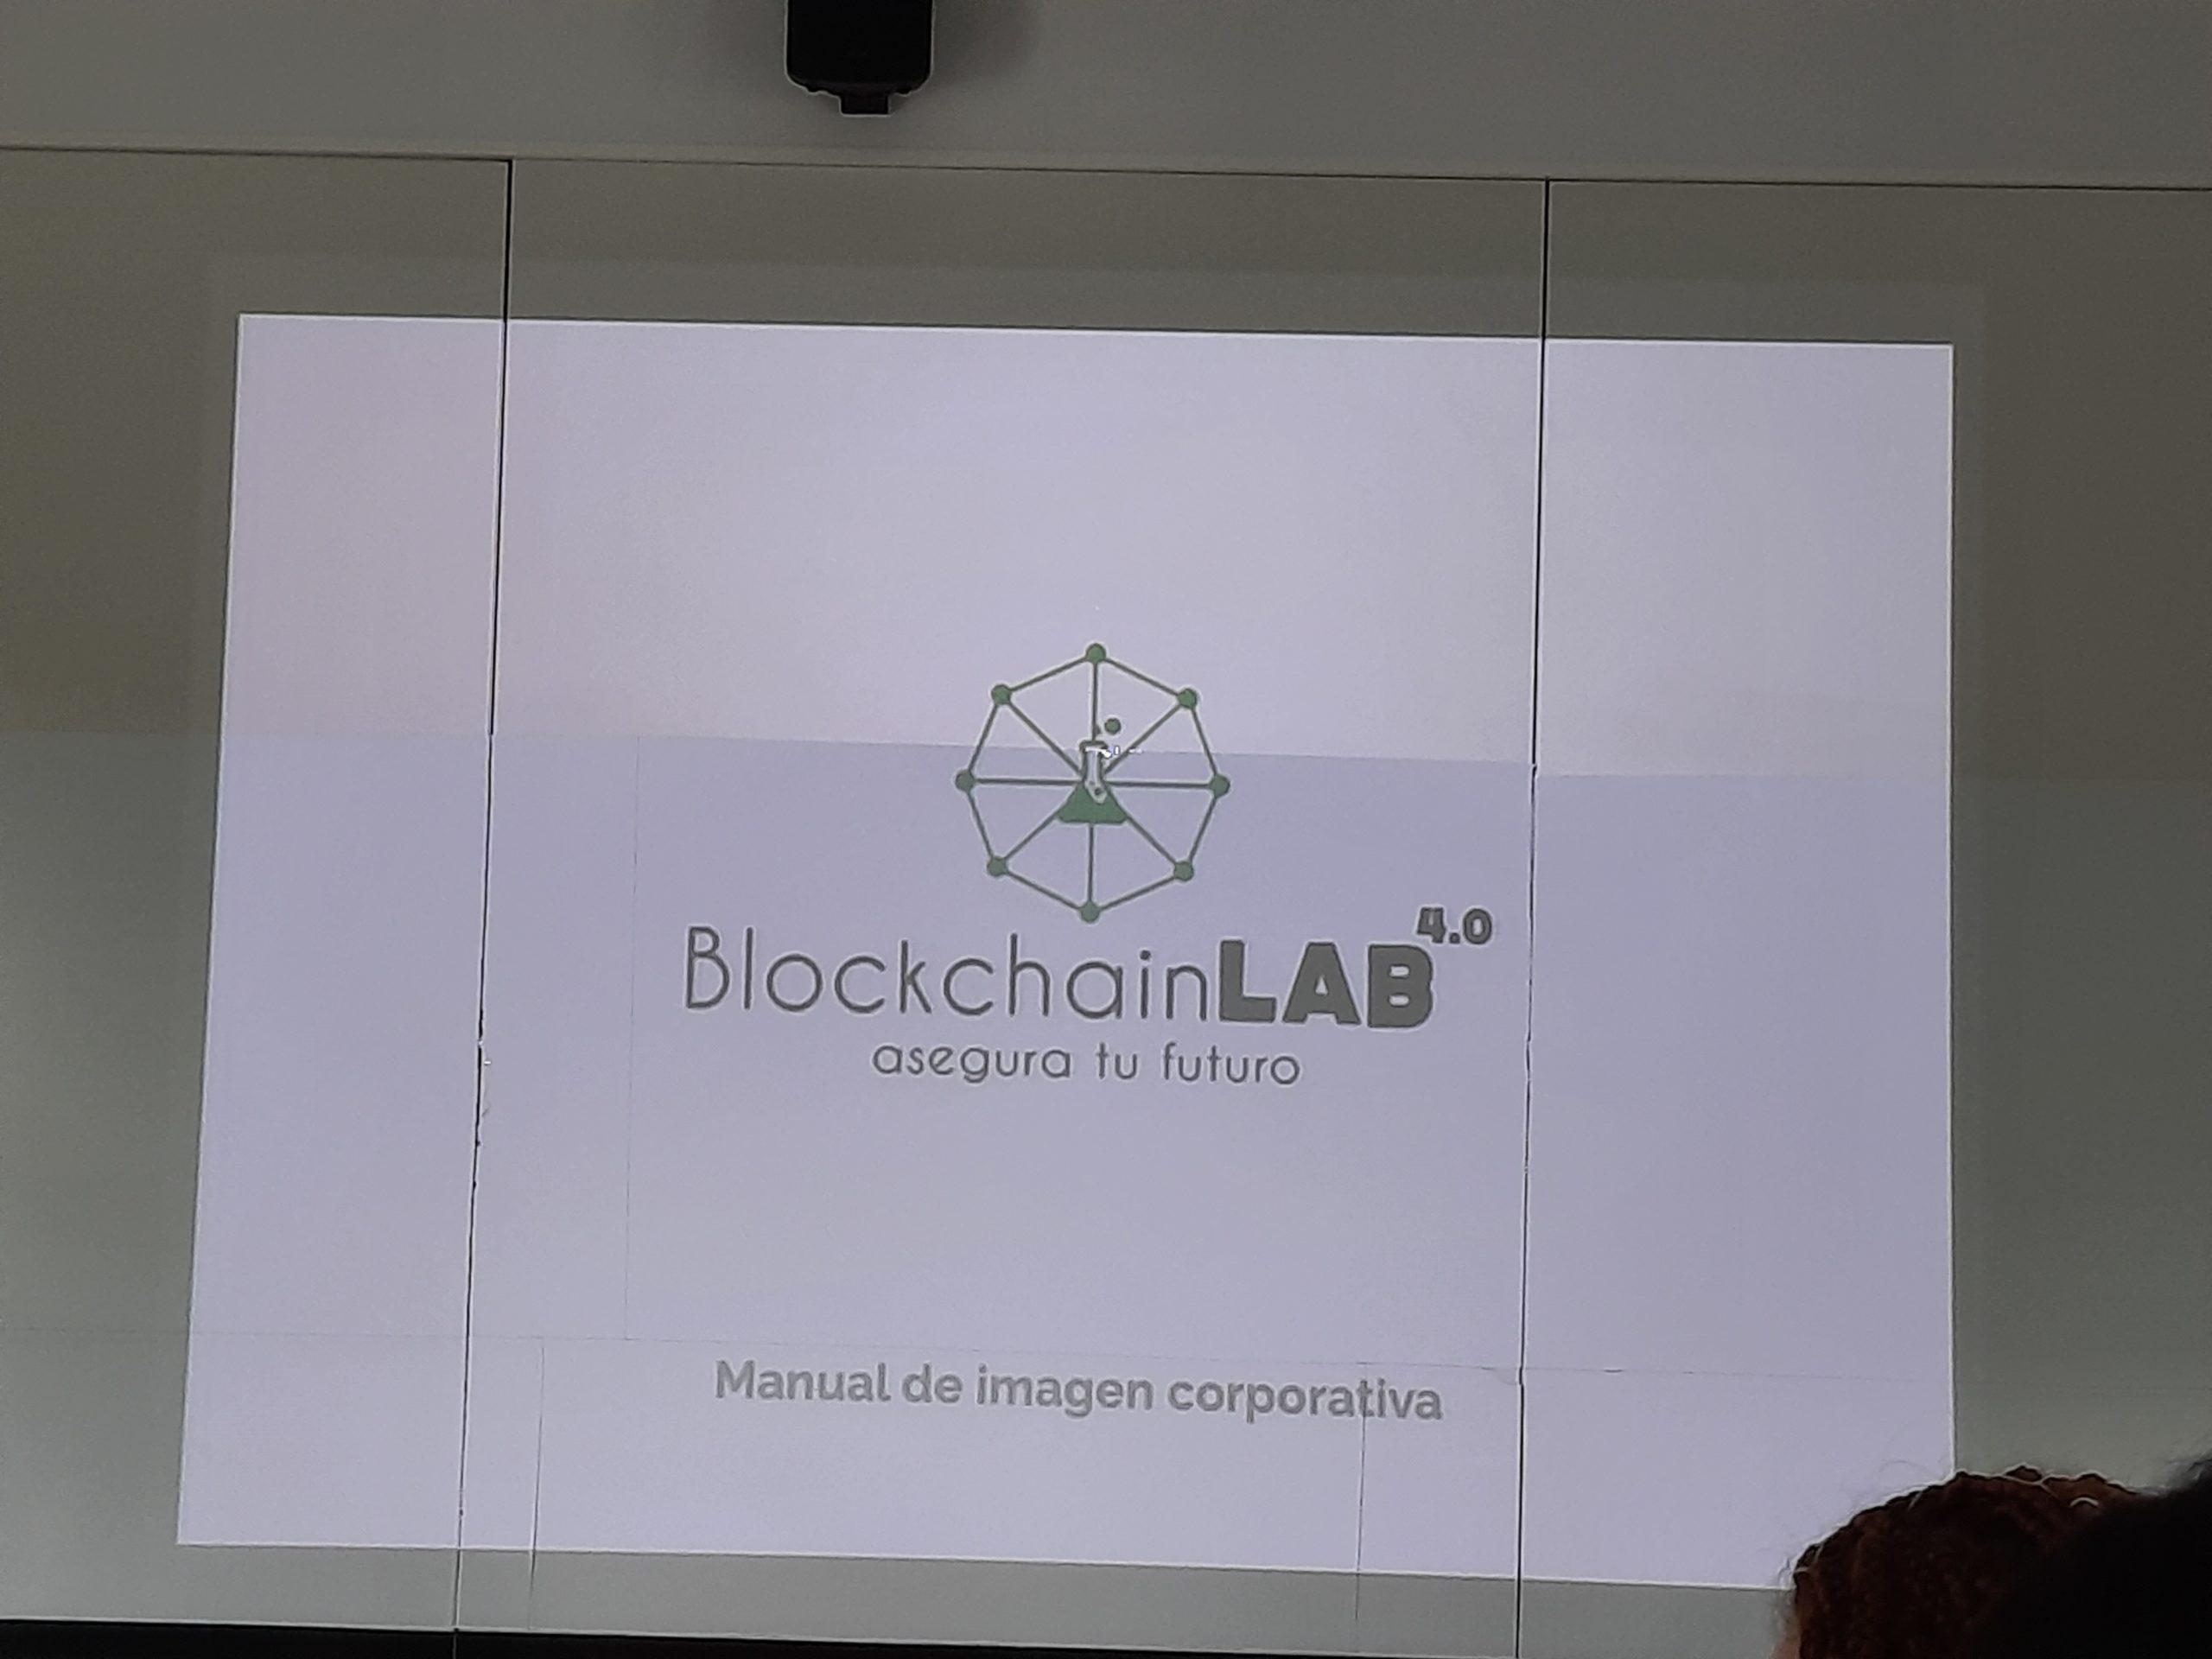 proyecto blockchain Lab 4.0